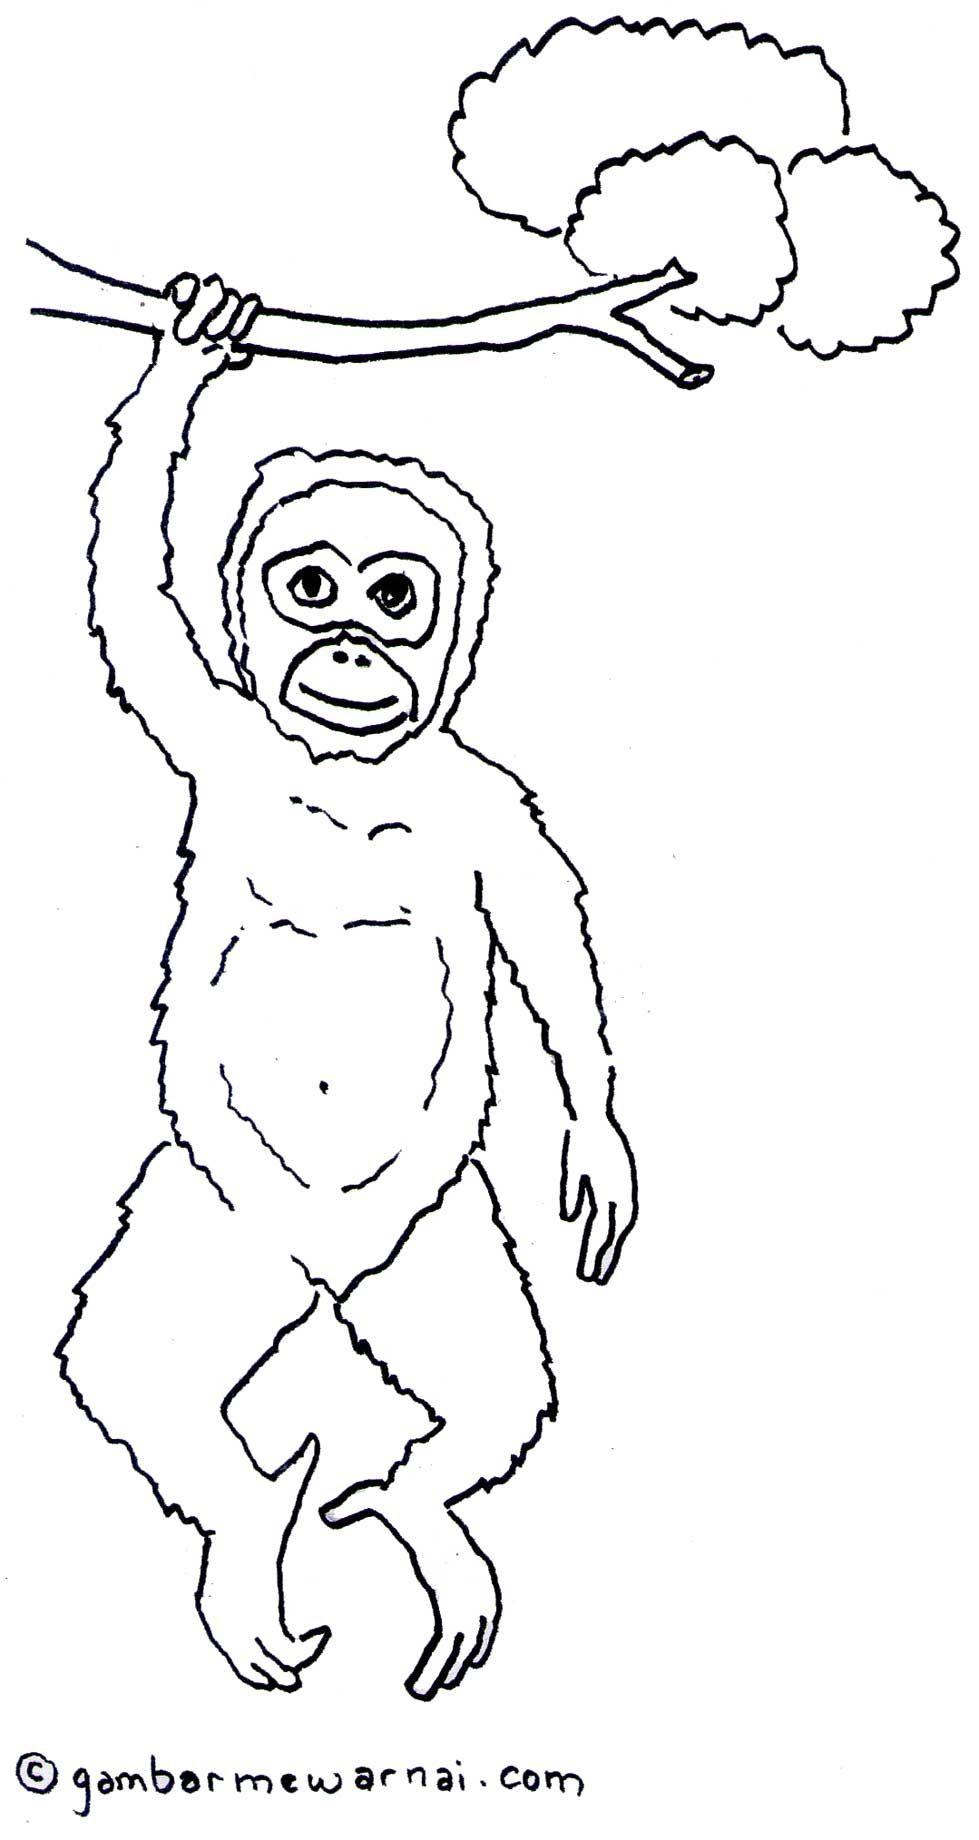 Gambar Mewarnai Hewan Orang Utan Download Art Projects To Try